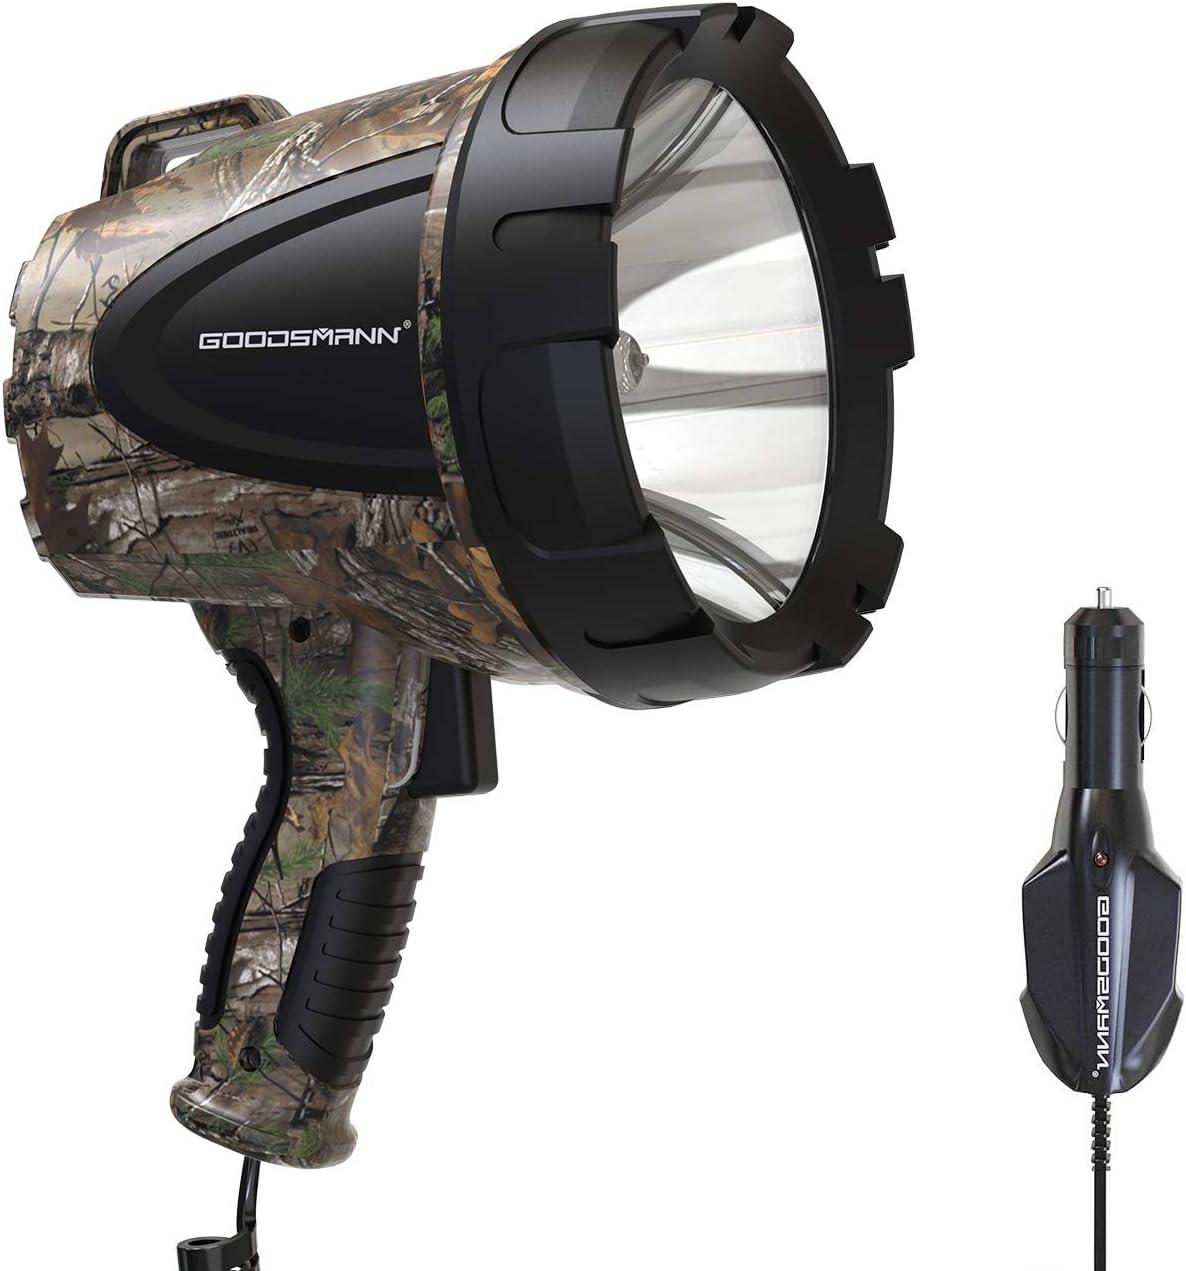 GOODSMANN Spotlight Hunting Camo Portable Handheld Light 1500 Lumen Realtree Xtra Halogen Lighting 12V with Oxford Bag TacticPro H102-01